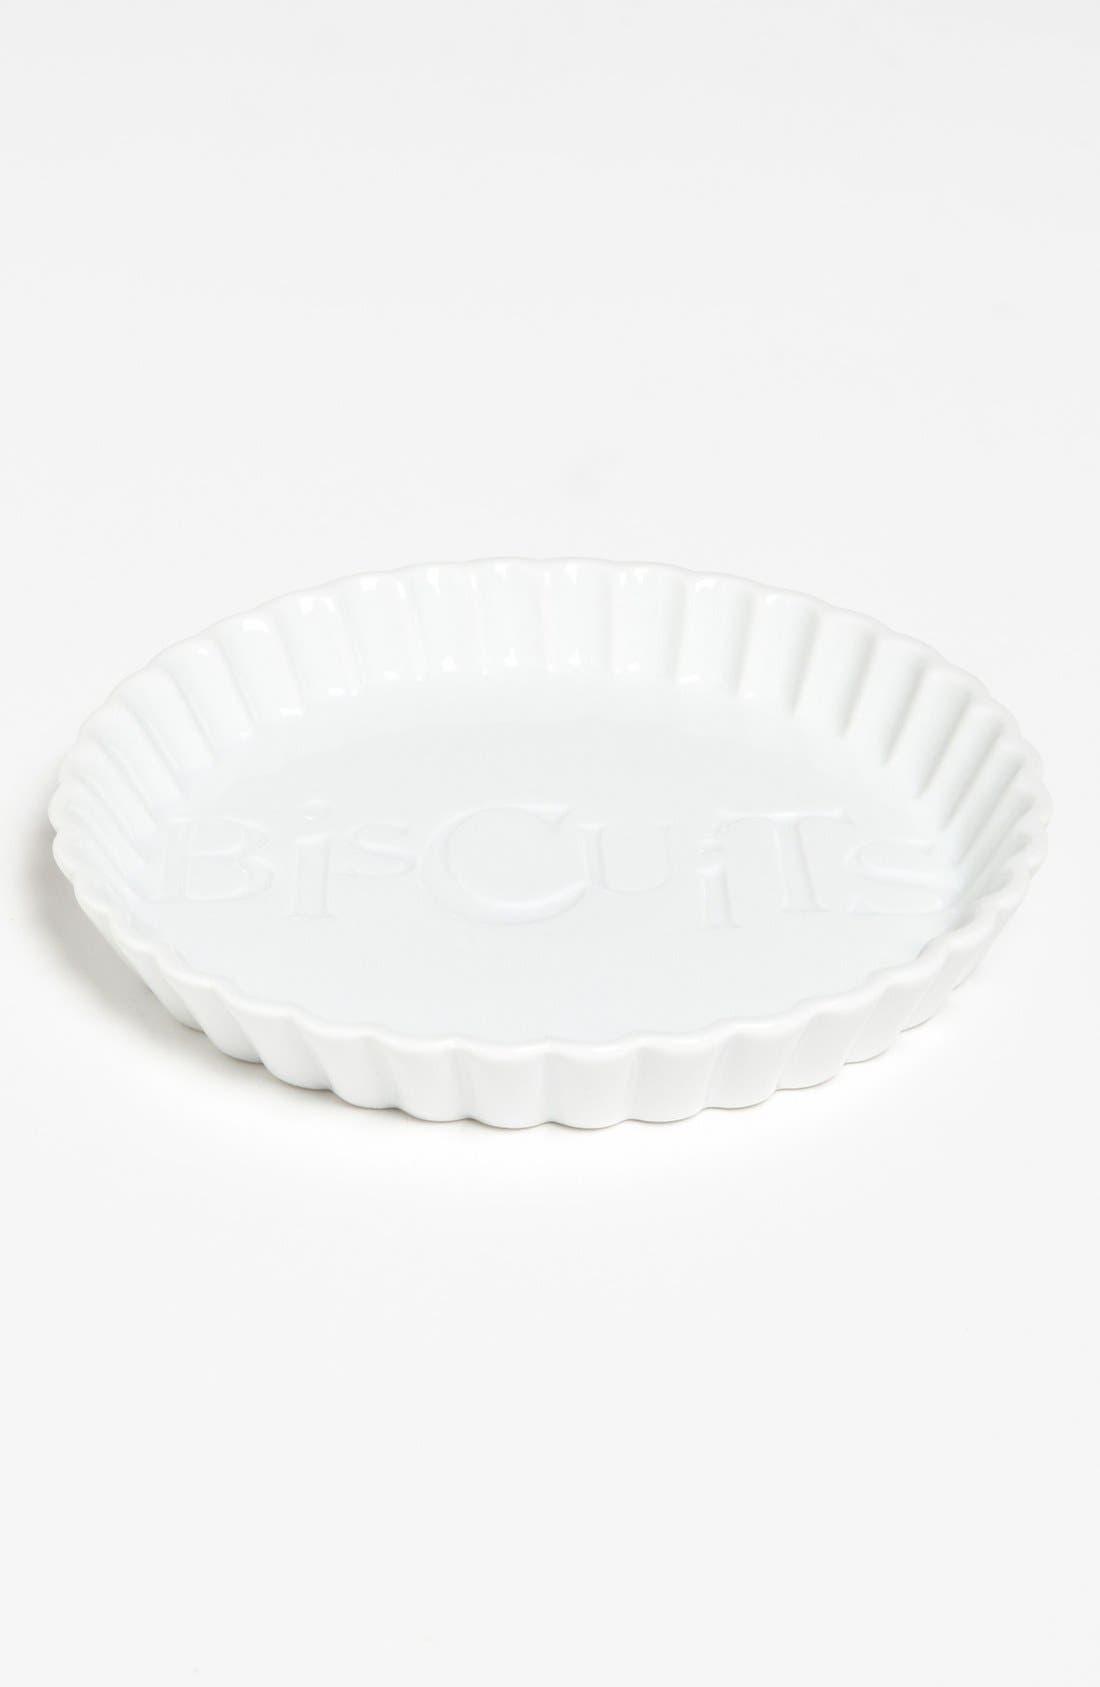 Alternate Image 1 Selected - Rosanna 'Savour - Biscuits' Porcelain Dish